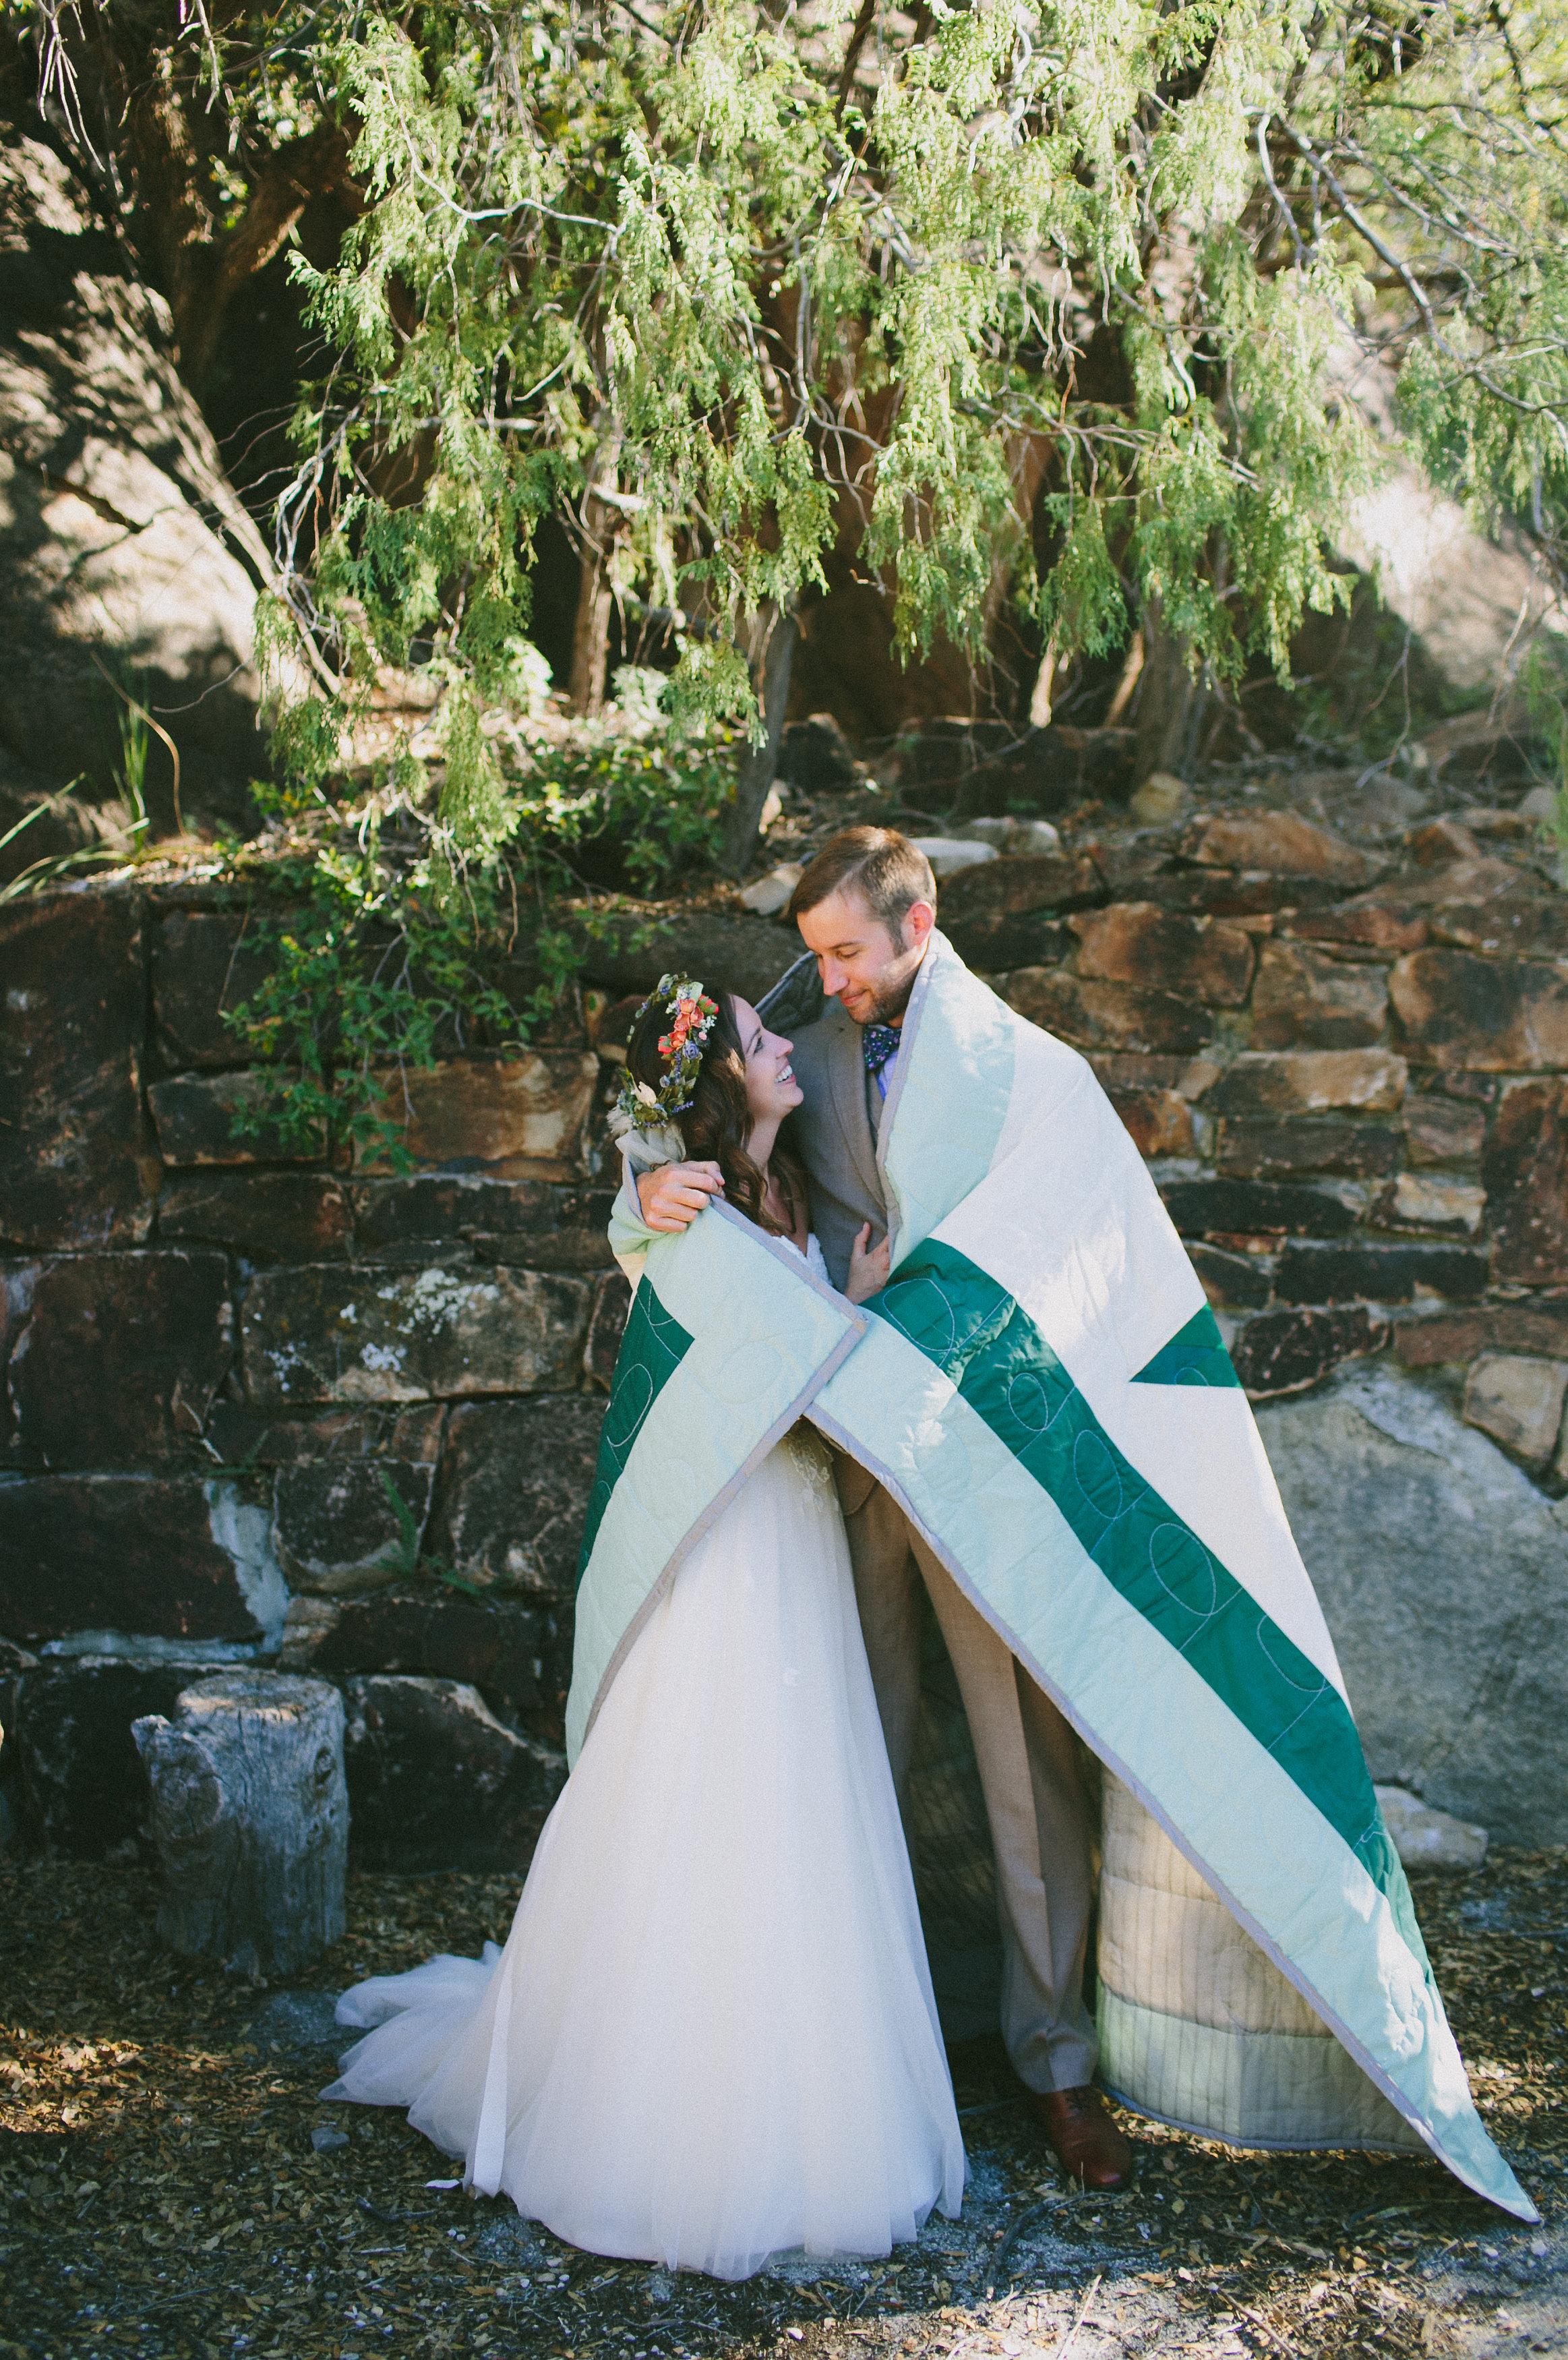 Wedding ceremony unity ideas